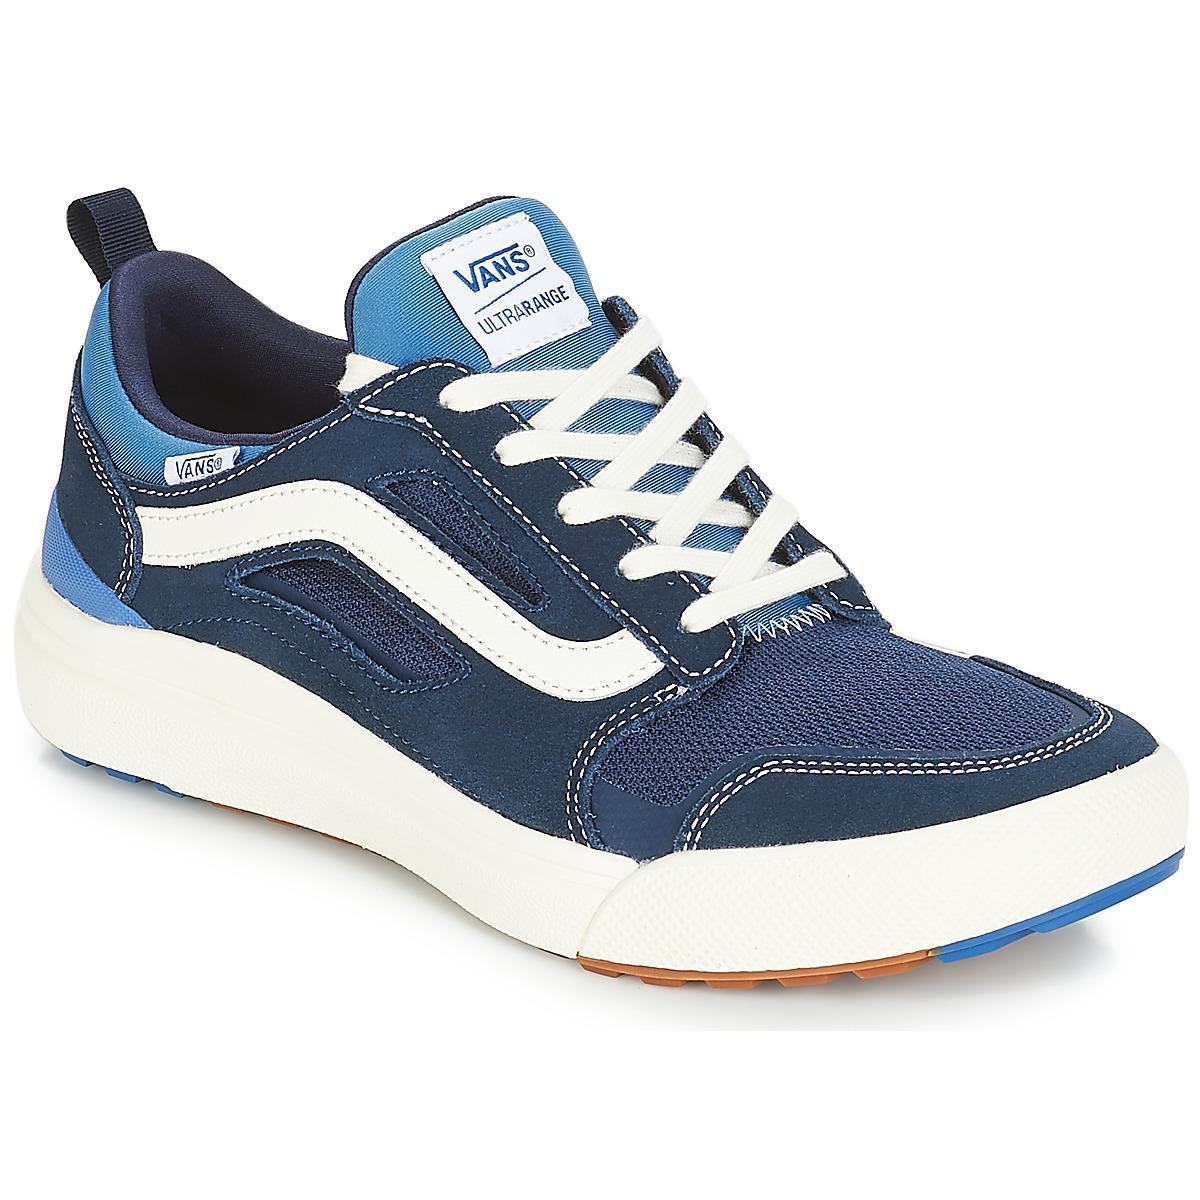 cb829715e08 Vans - Blue Ultrarange 3d Shoes (trainers) for Men - Lyst. View fullscreen